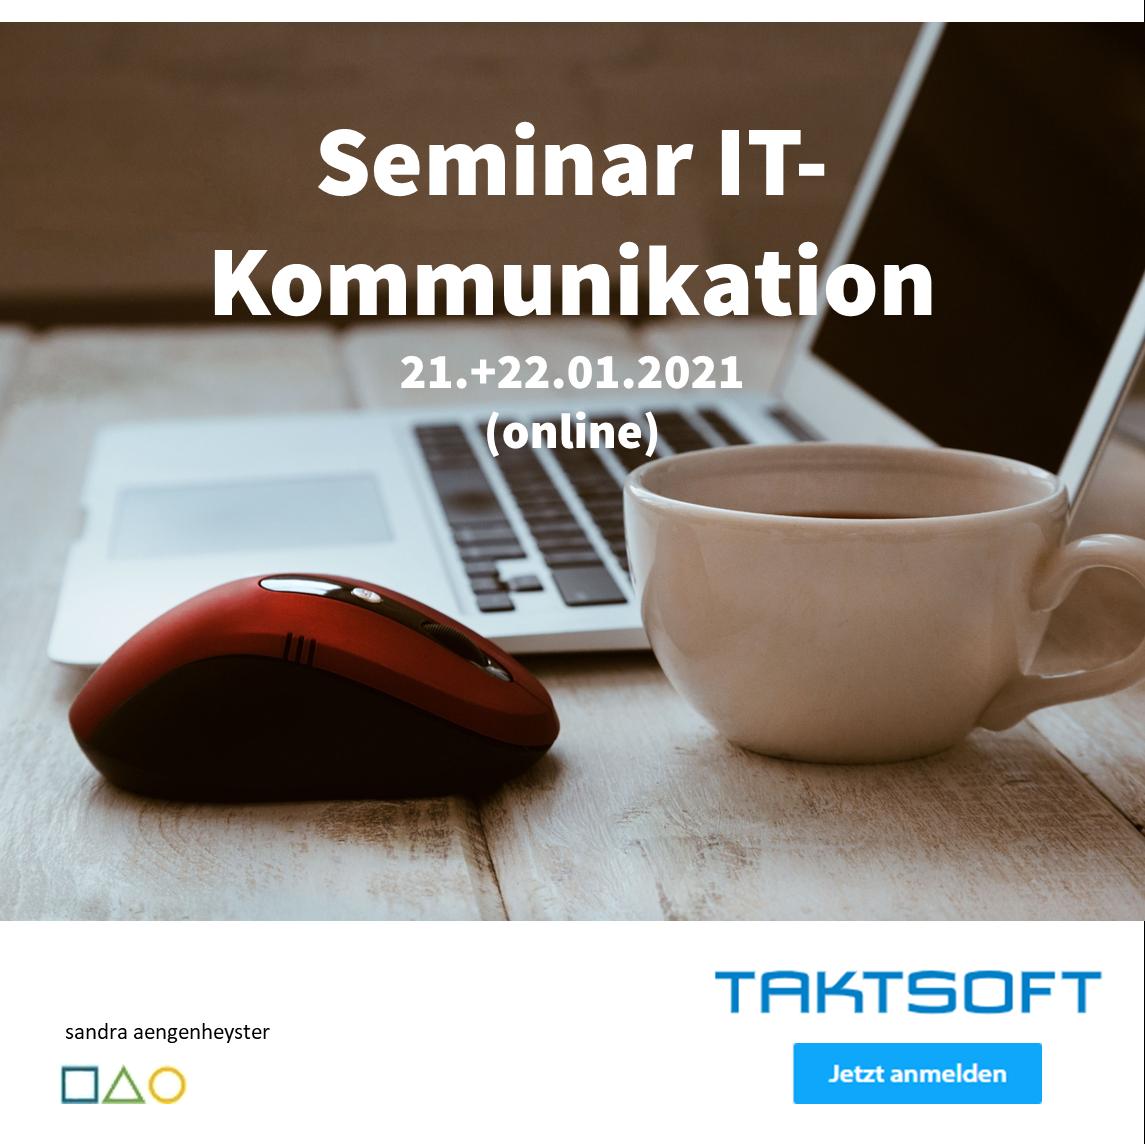 Seminar IT-Kommunikation taktsoft campus